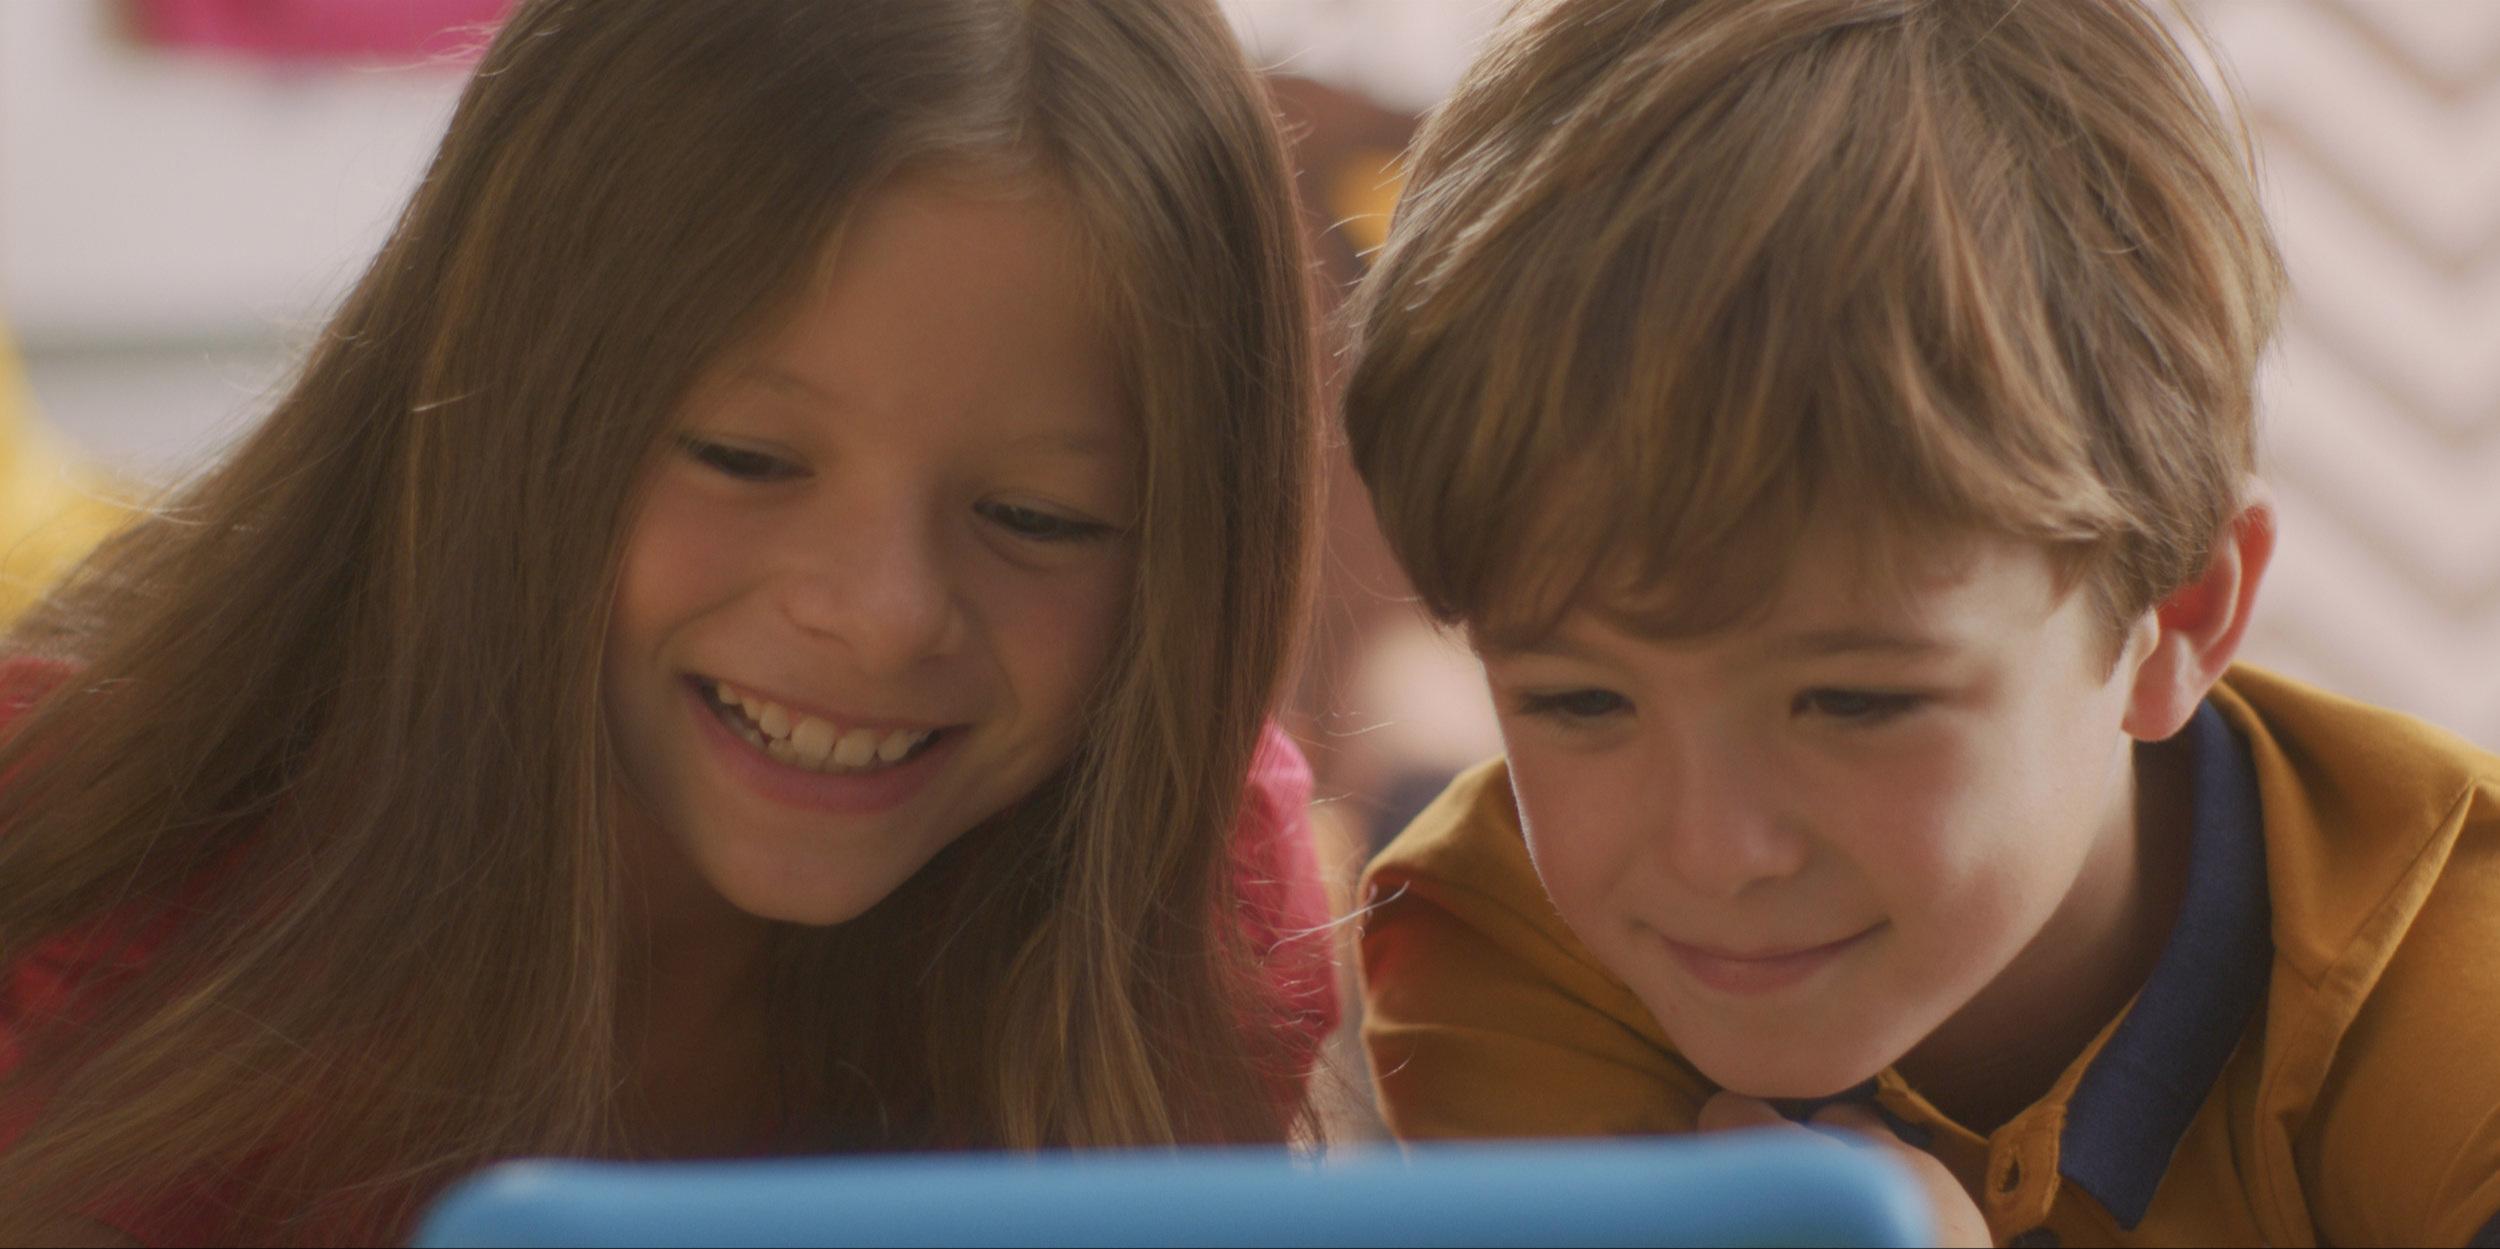 Nokia-WiFi_Spy-Kids_Still-021.jpg